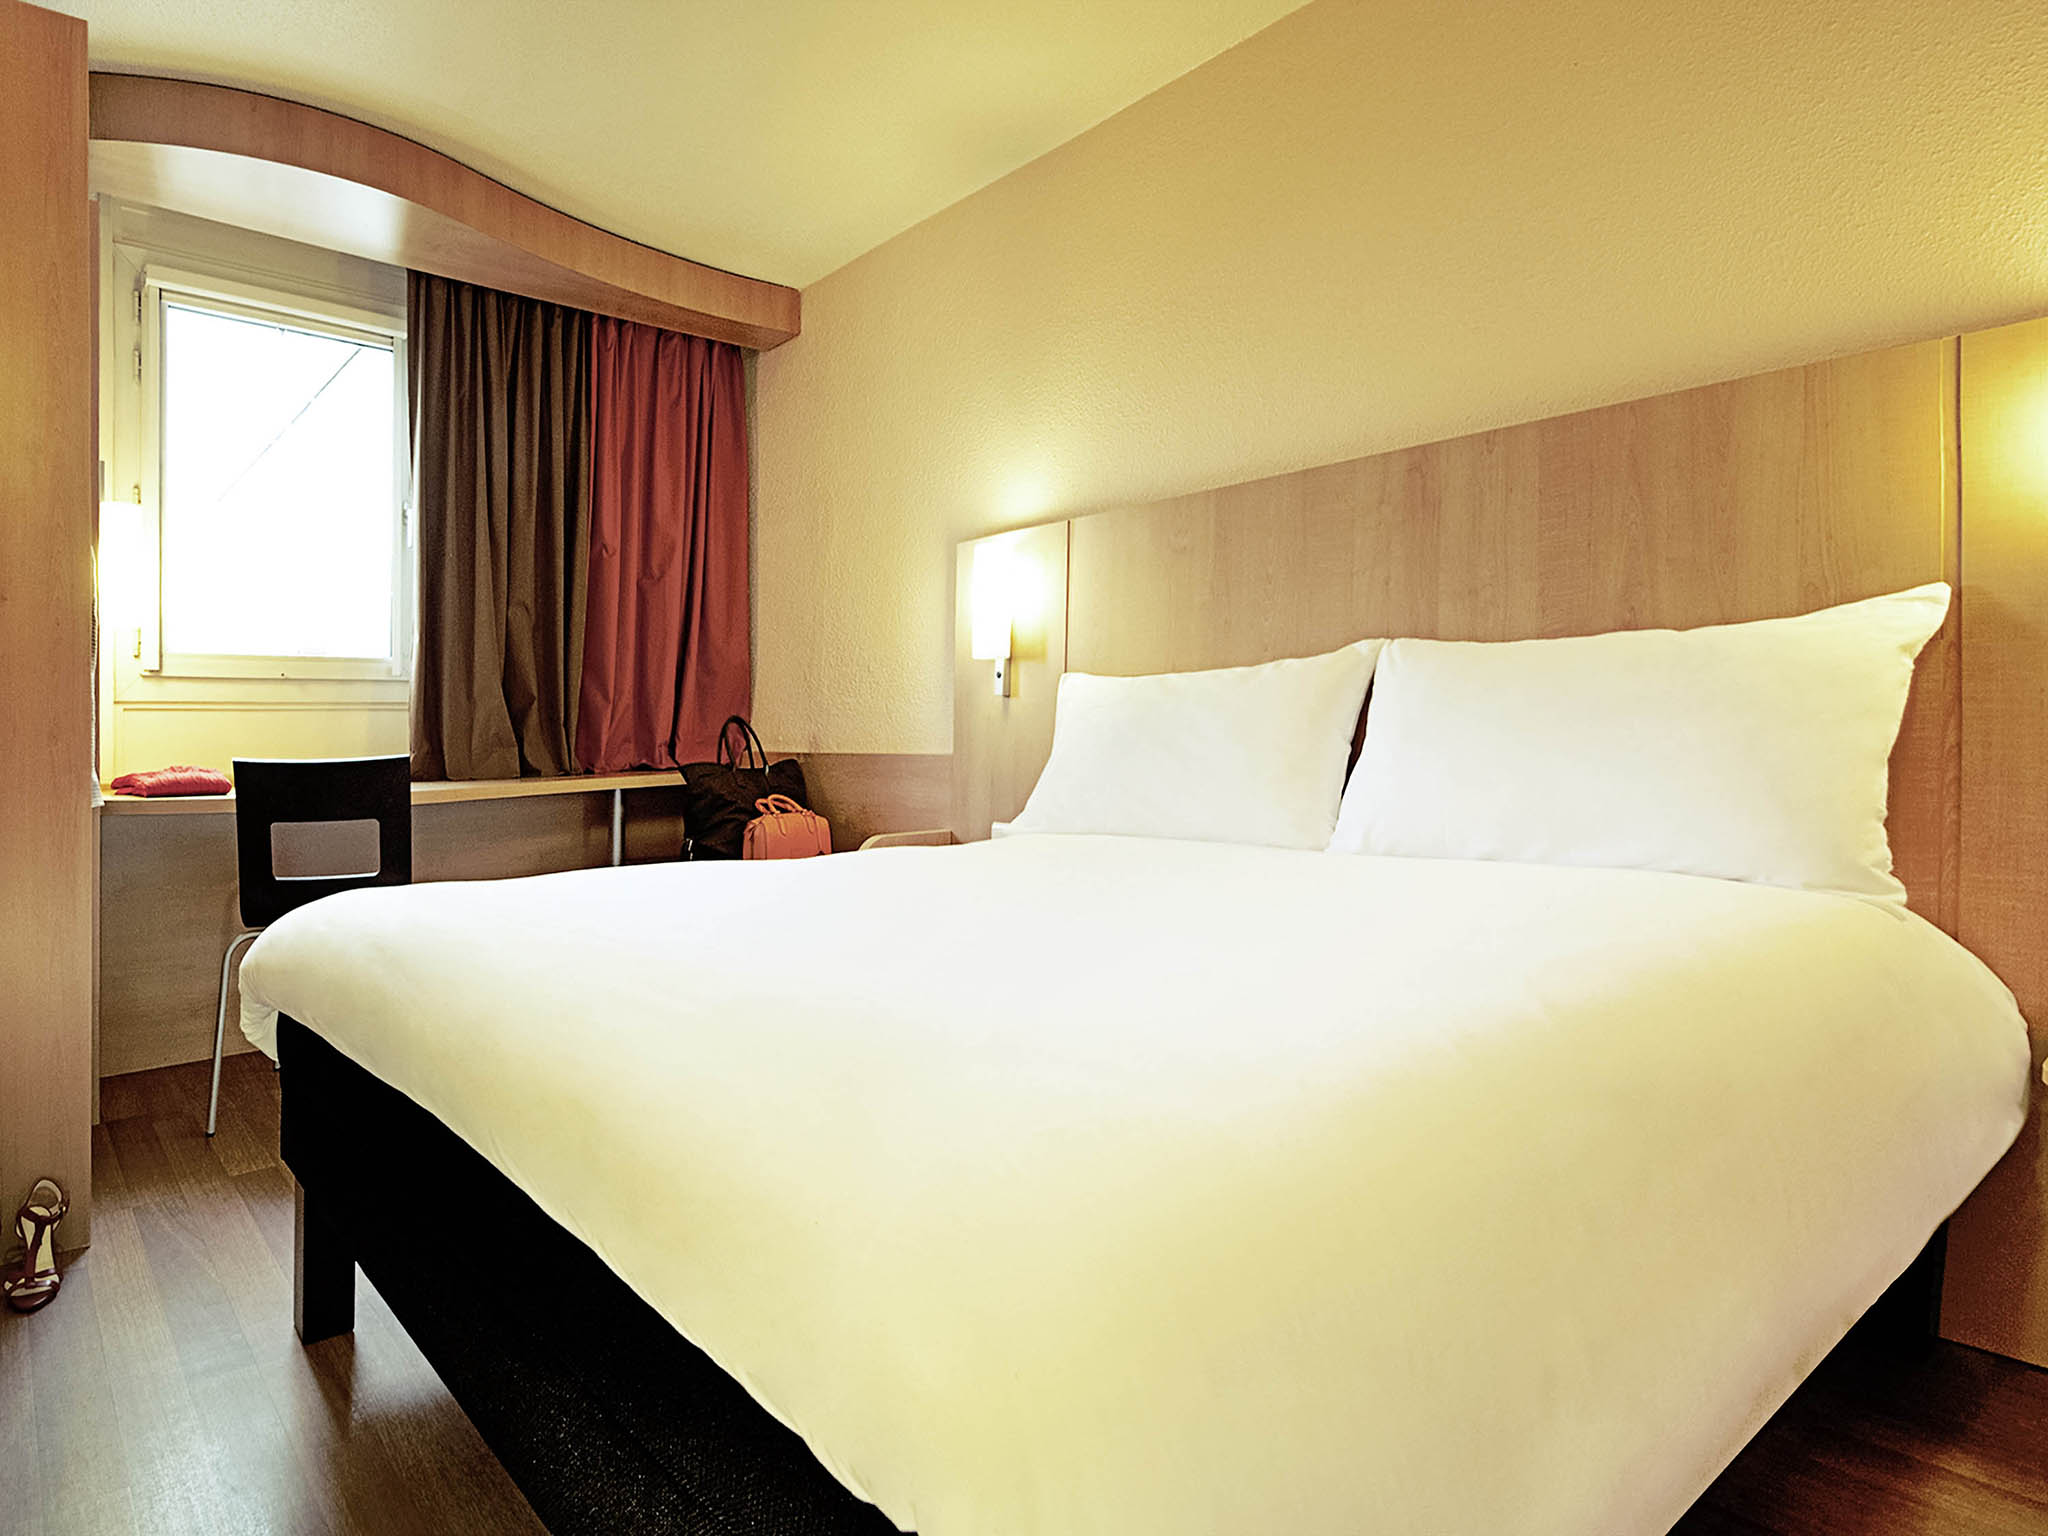 Hotel in MONTROUGE ibis Paris Porte d Orleans